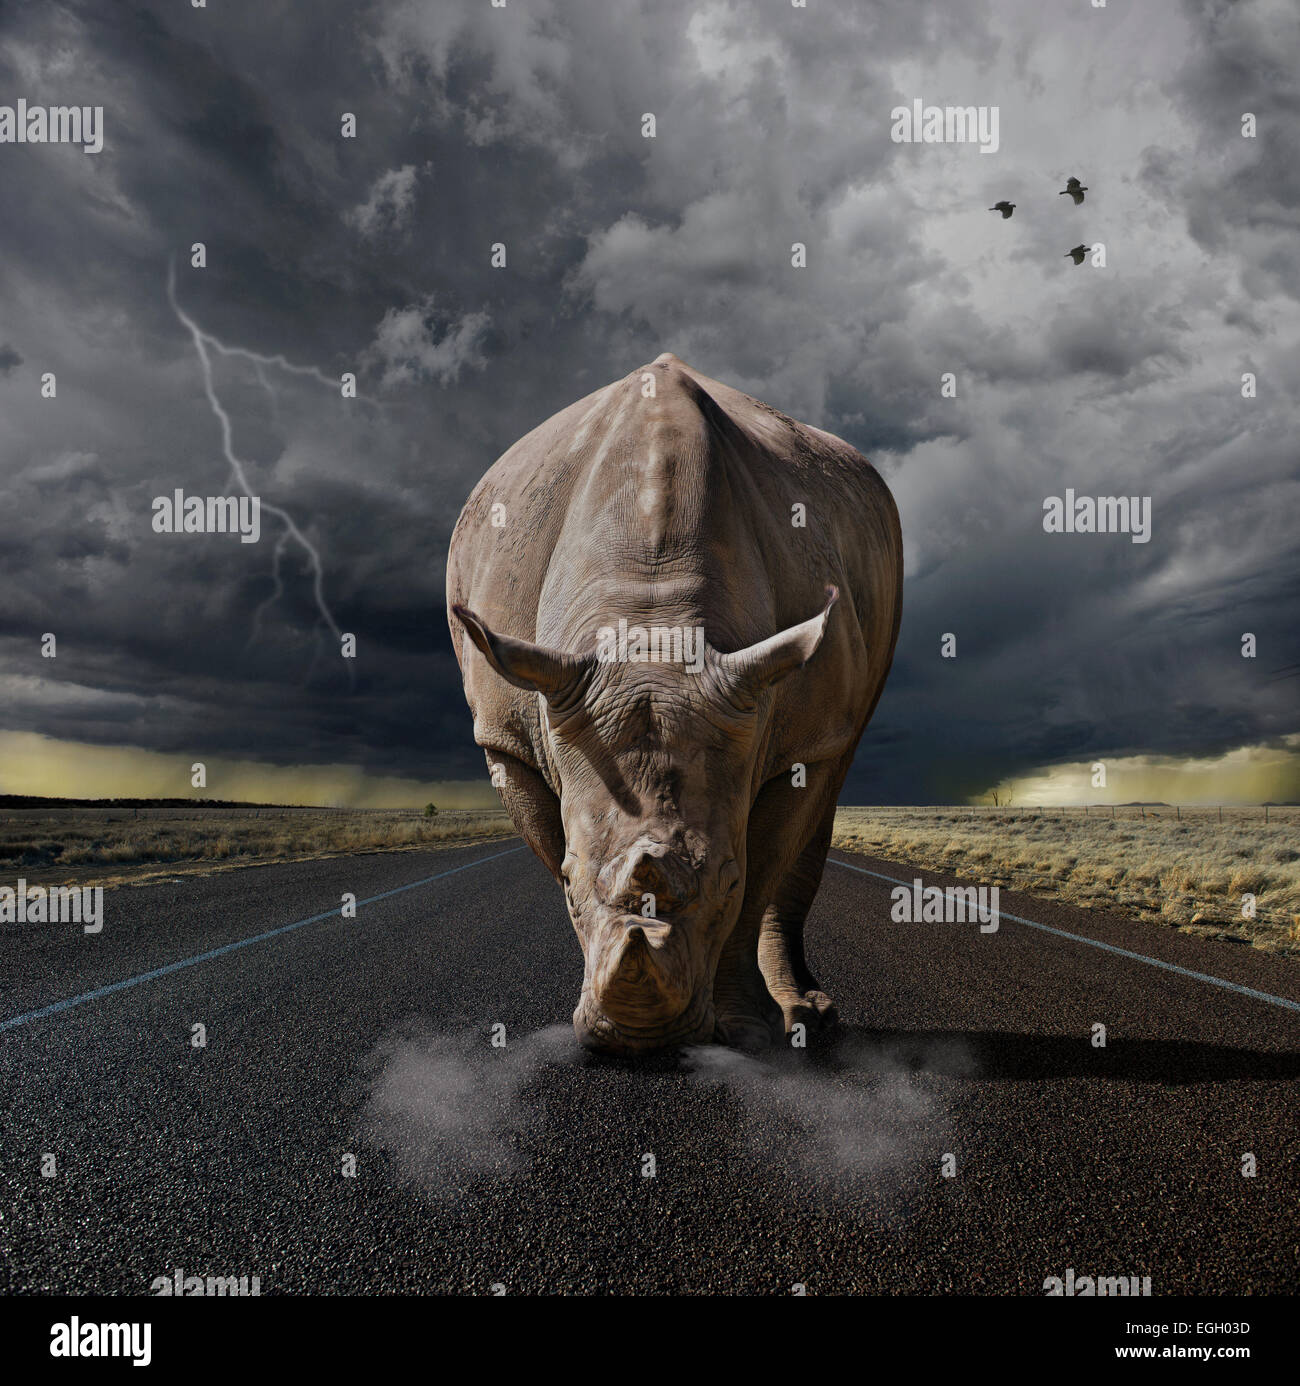 Large rhino ready to charge - Stock Image